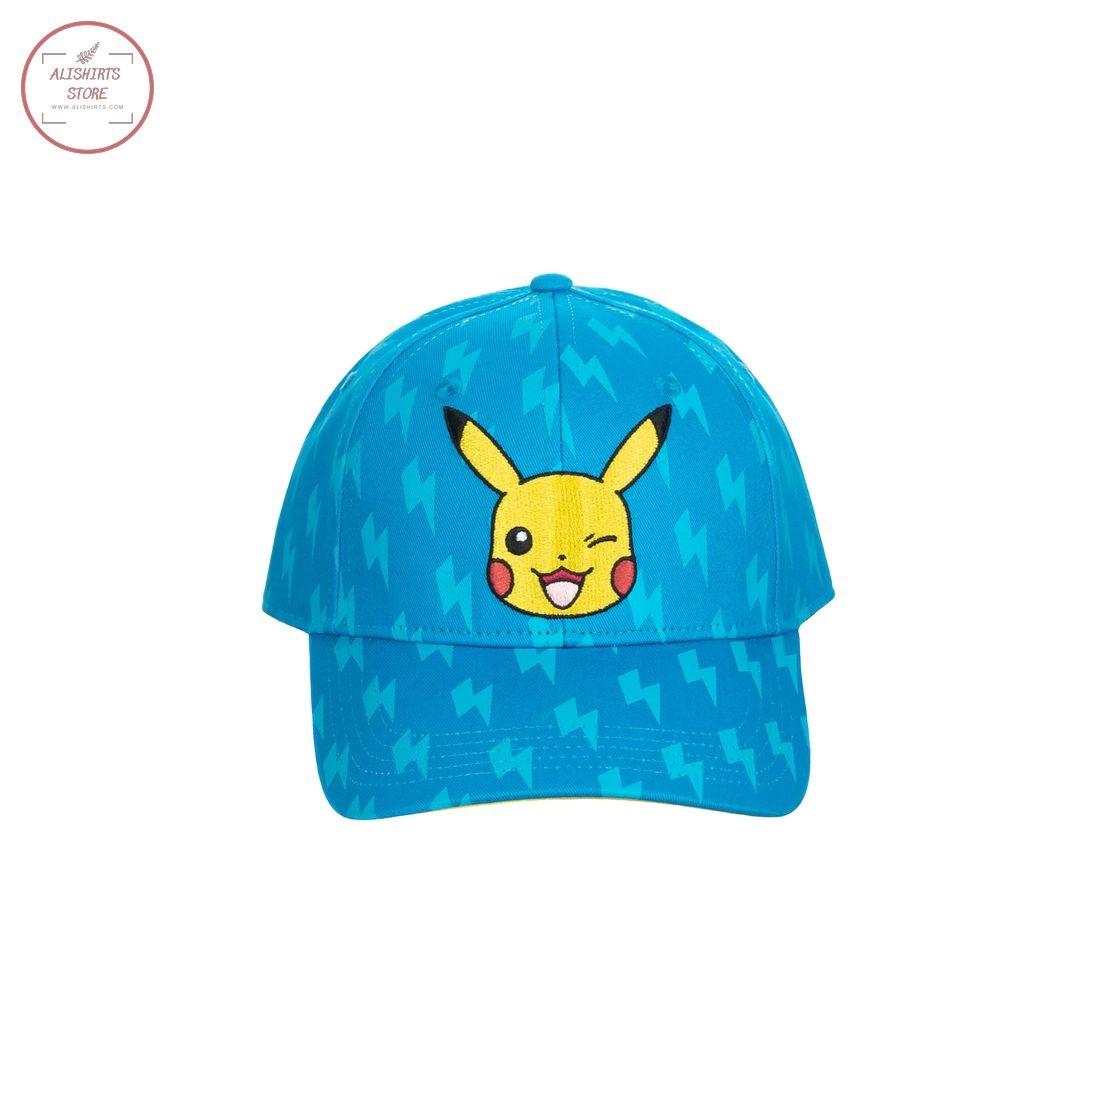 Pokemon Pikachu Allover Print Hat